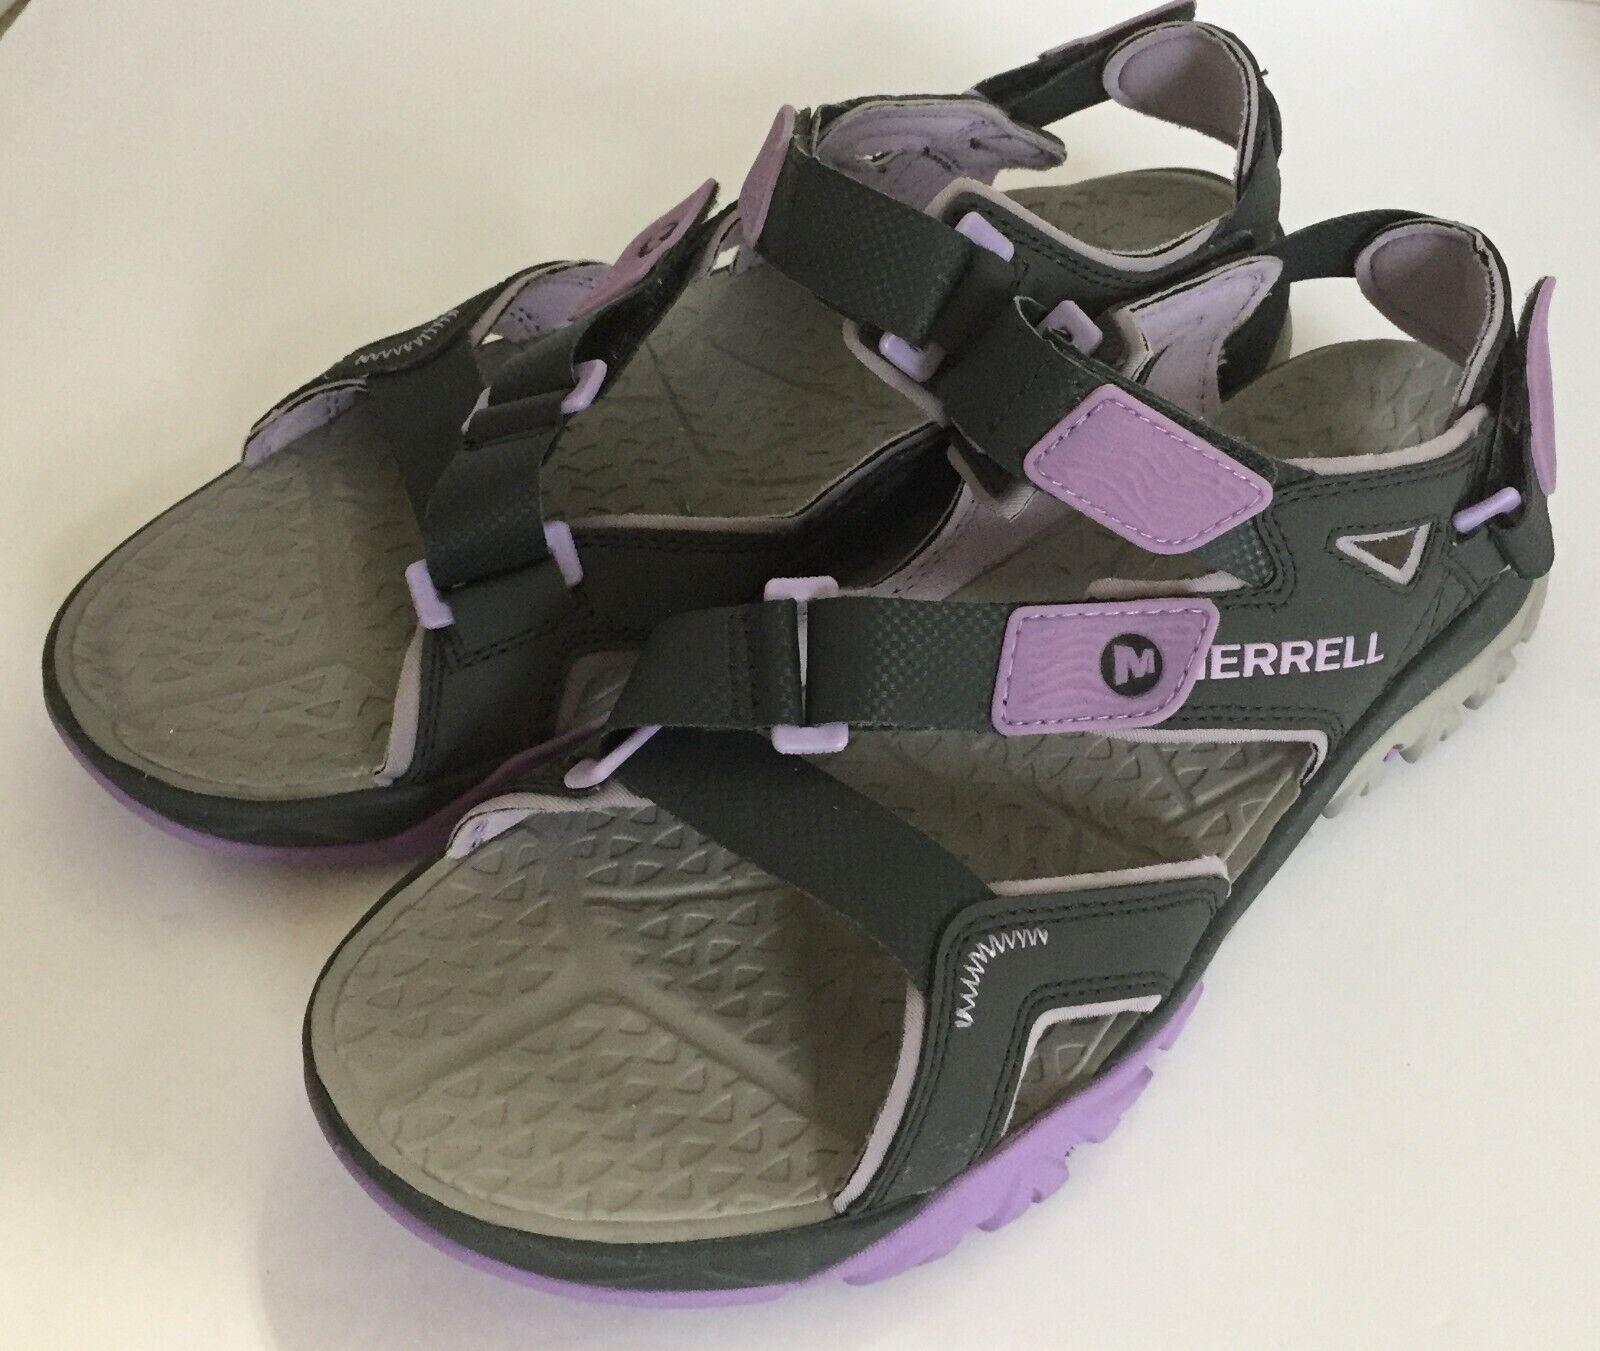 Women's Merrell Tetrex Crest Strap Granite Purple Sport Sandals 9 M